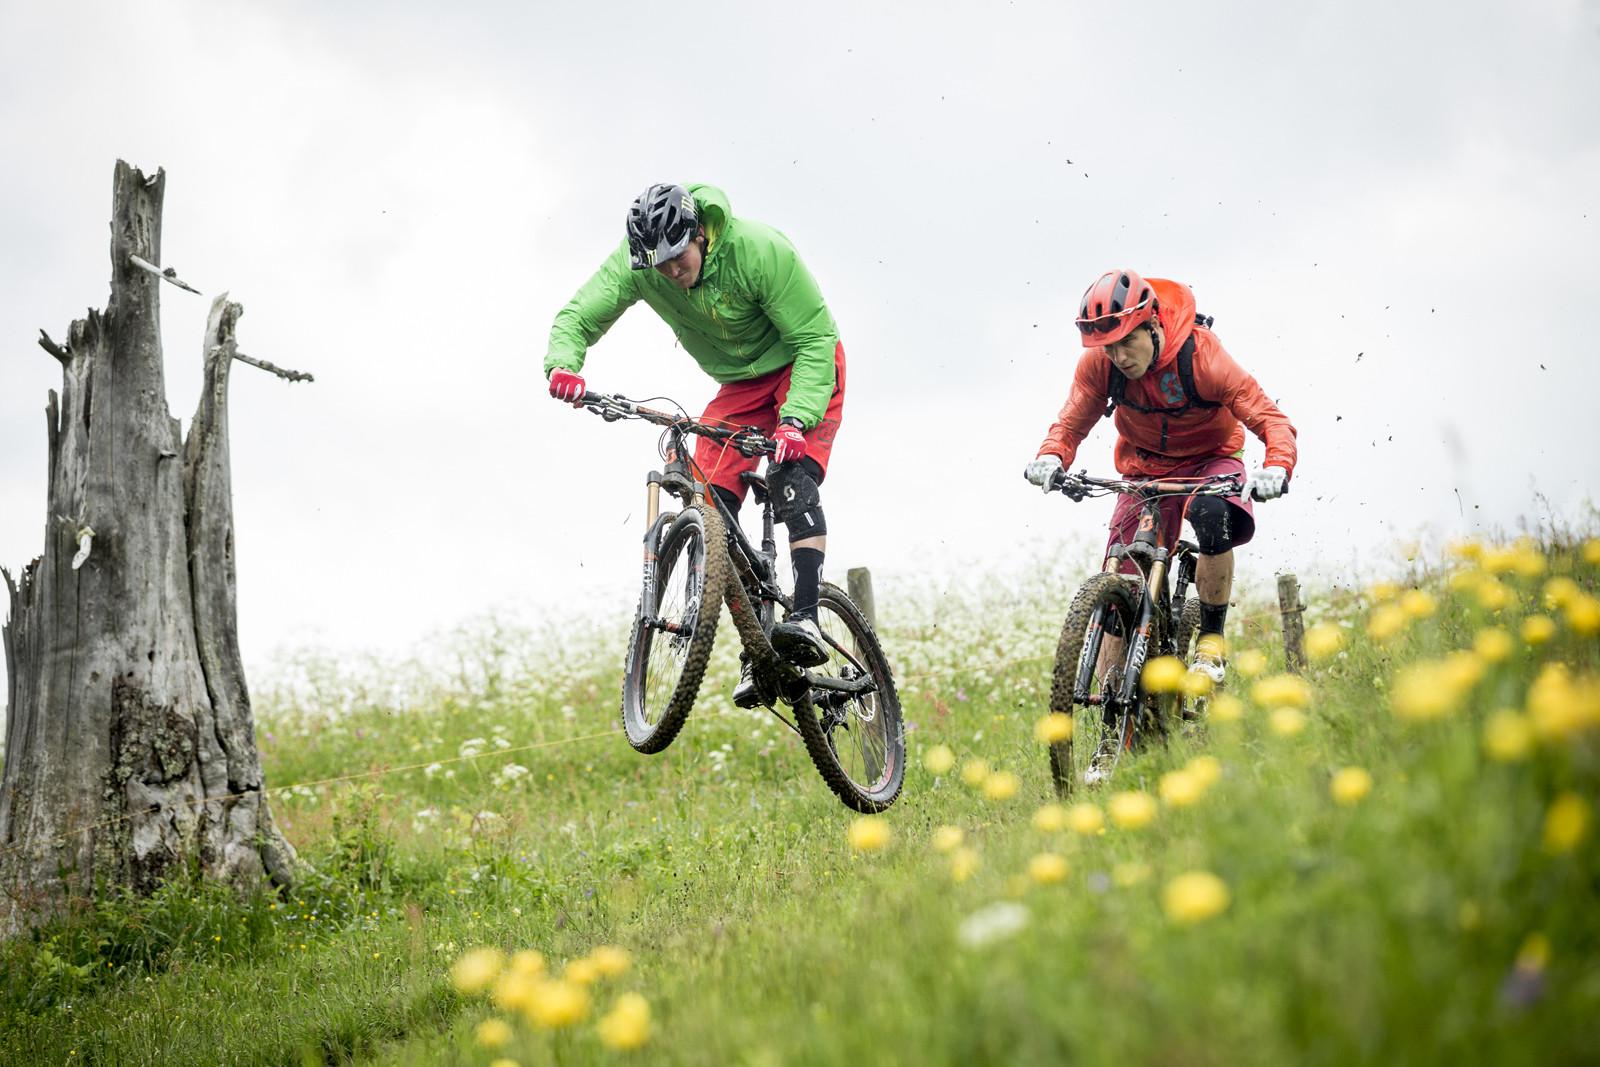 9 Killer Shots of Brendan Fairclough and Nino Schurter on the All-New 2014 Scott Genius LT - Brendan Fairclough and Nino Schurter on the 2014 Scott Genius LT - Mountain Biking Pictures - Vital MTB